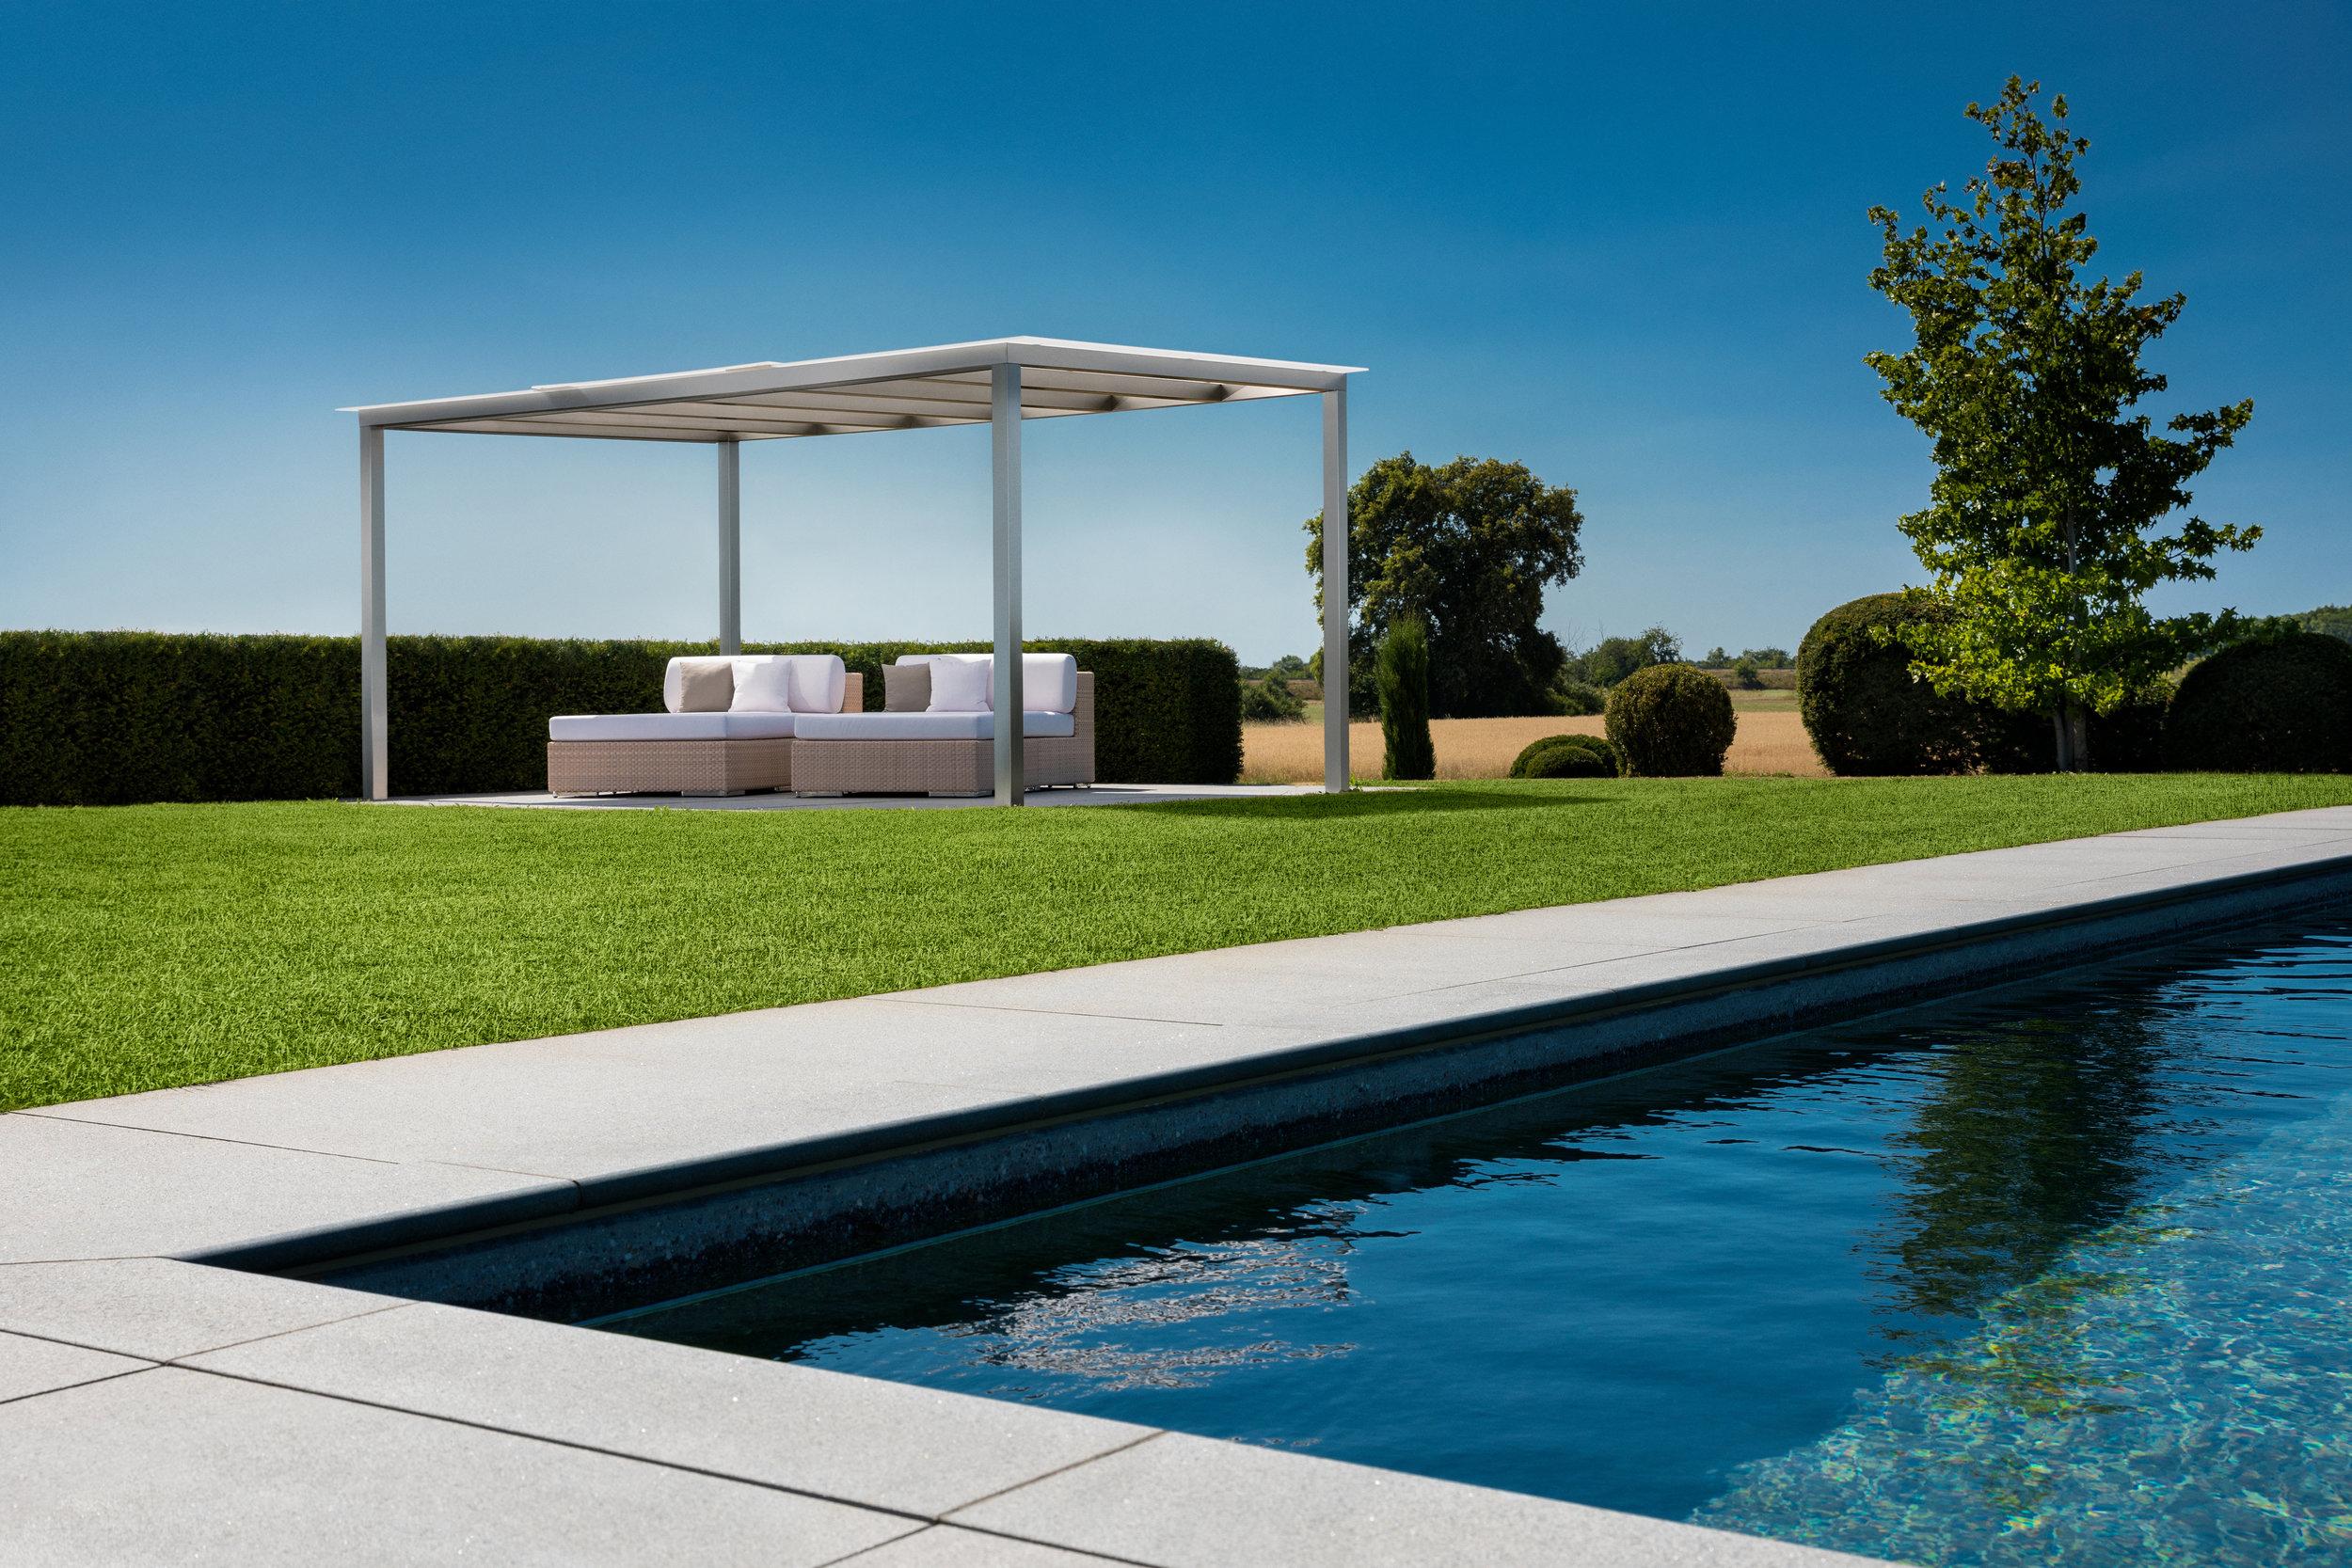 Pergola rewalux auf großem Grundstück mit Pool.jpg